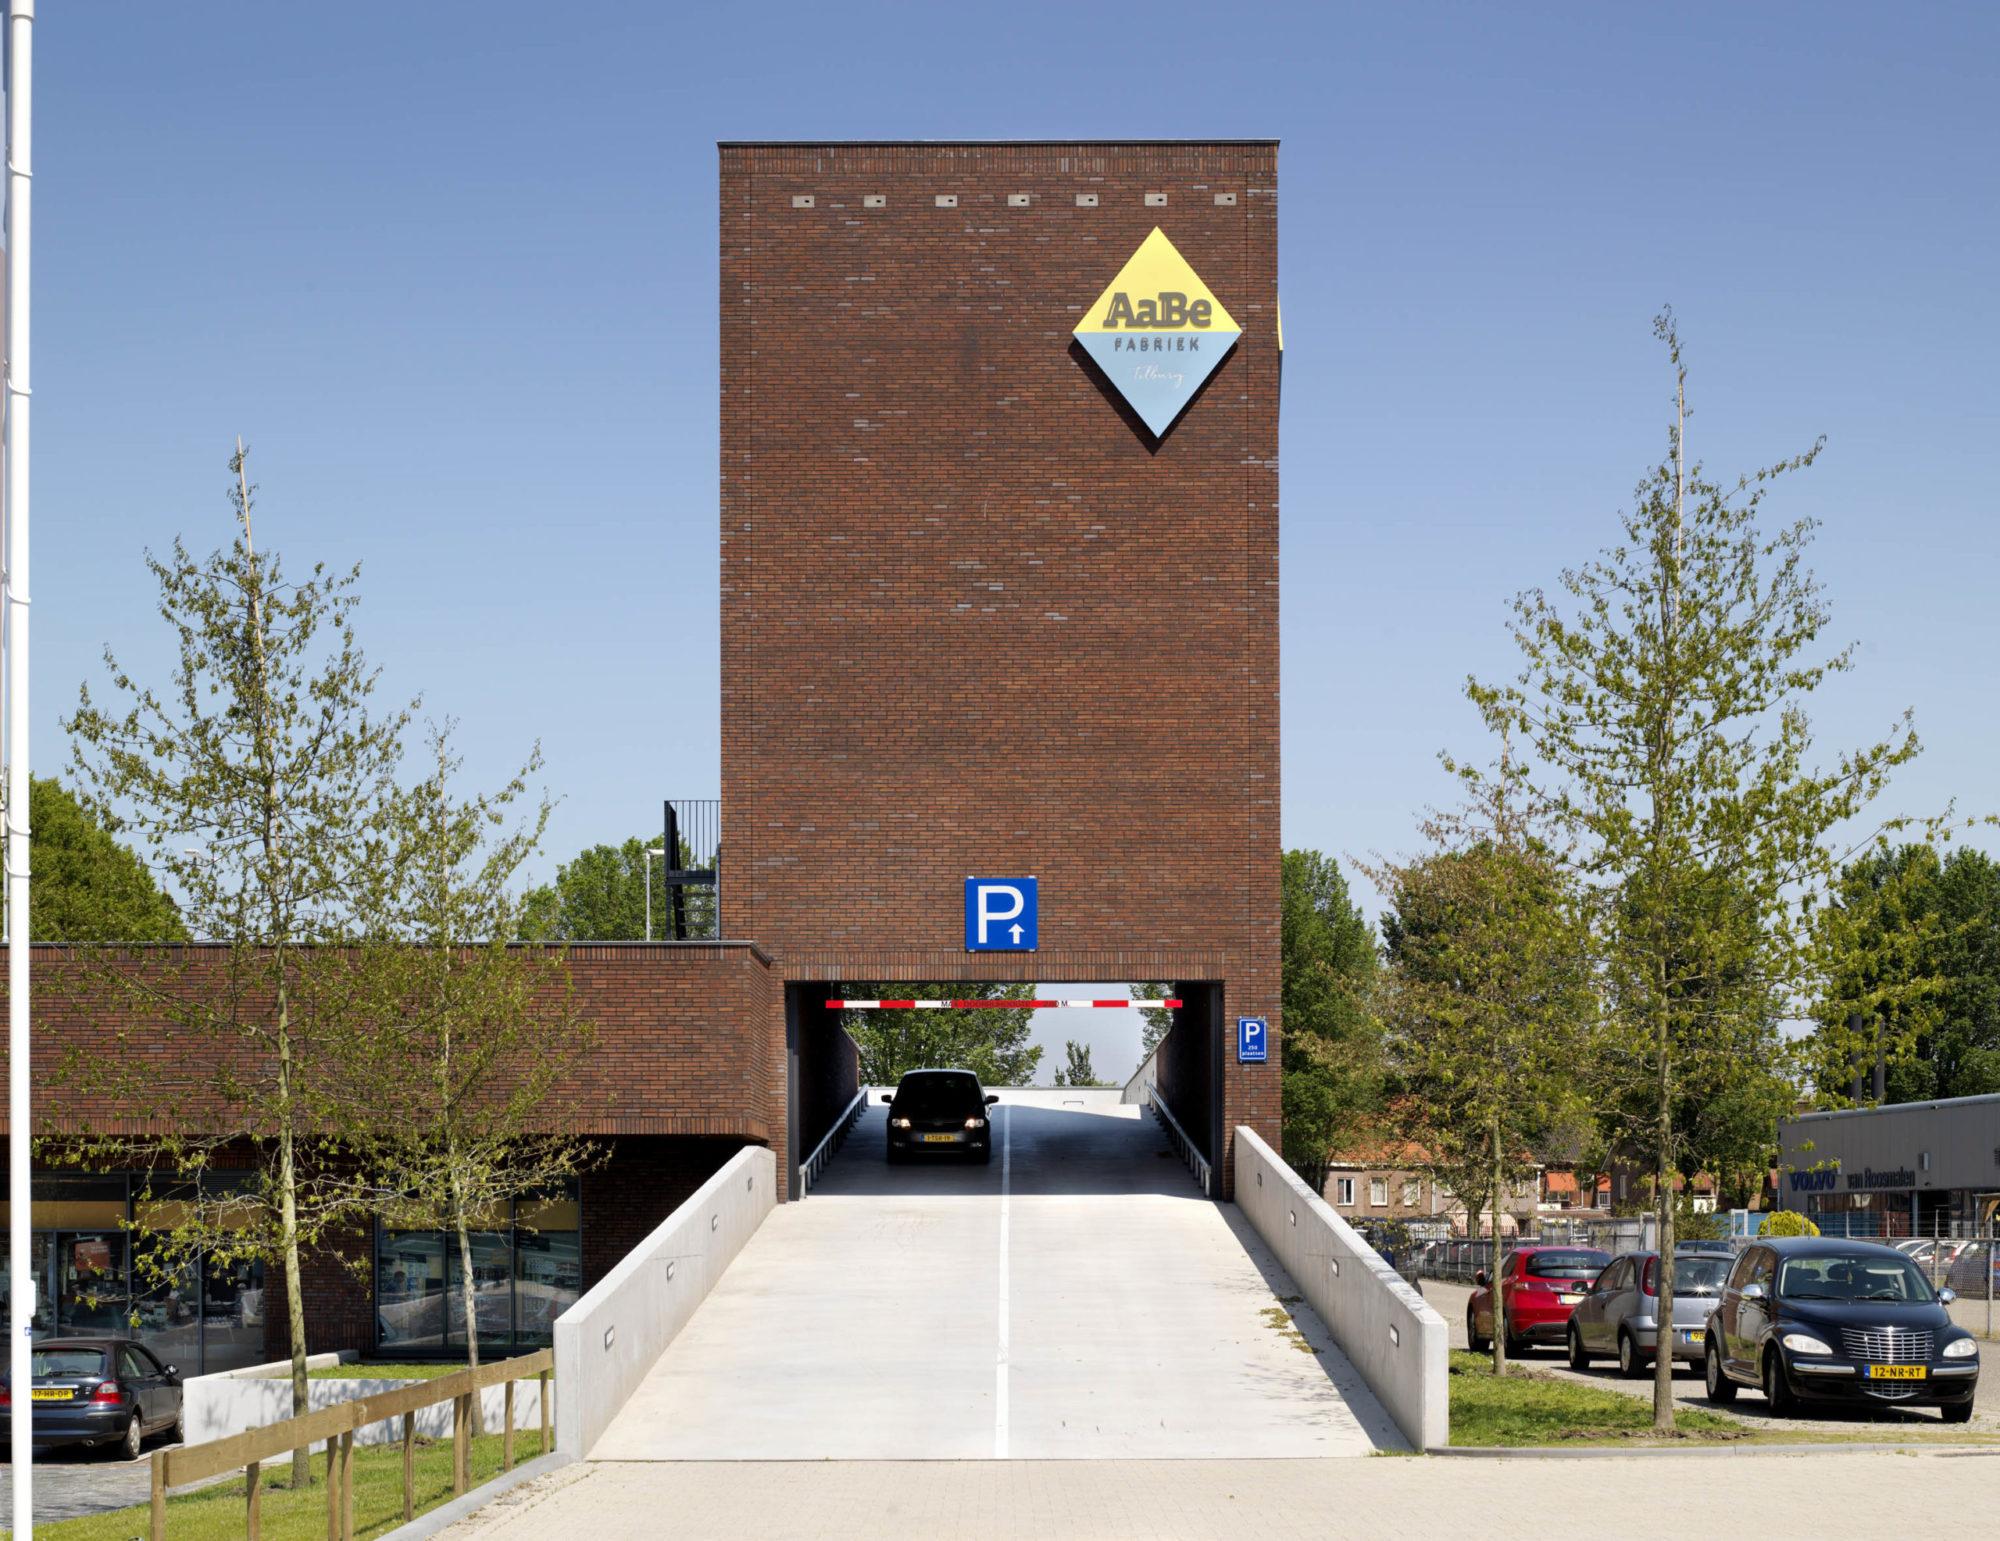 AaBe Tilburg